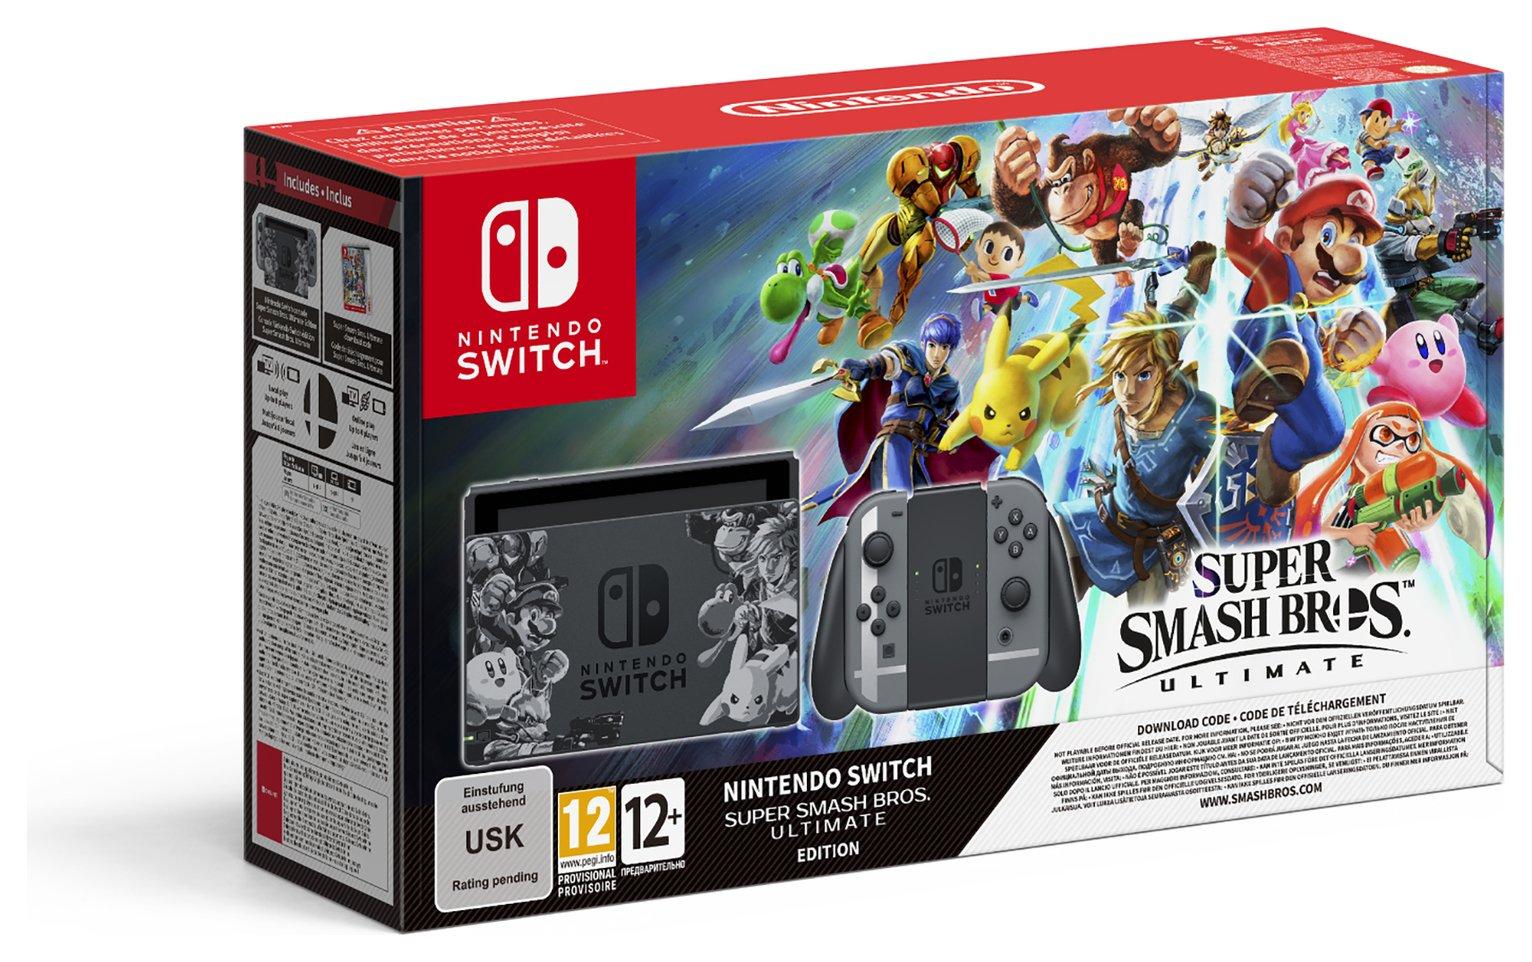 Nintendo Switch & Super Smash Bros Ultimate Bundle Pre-Order